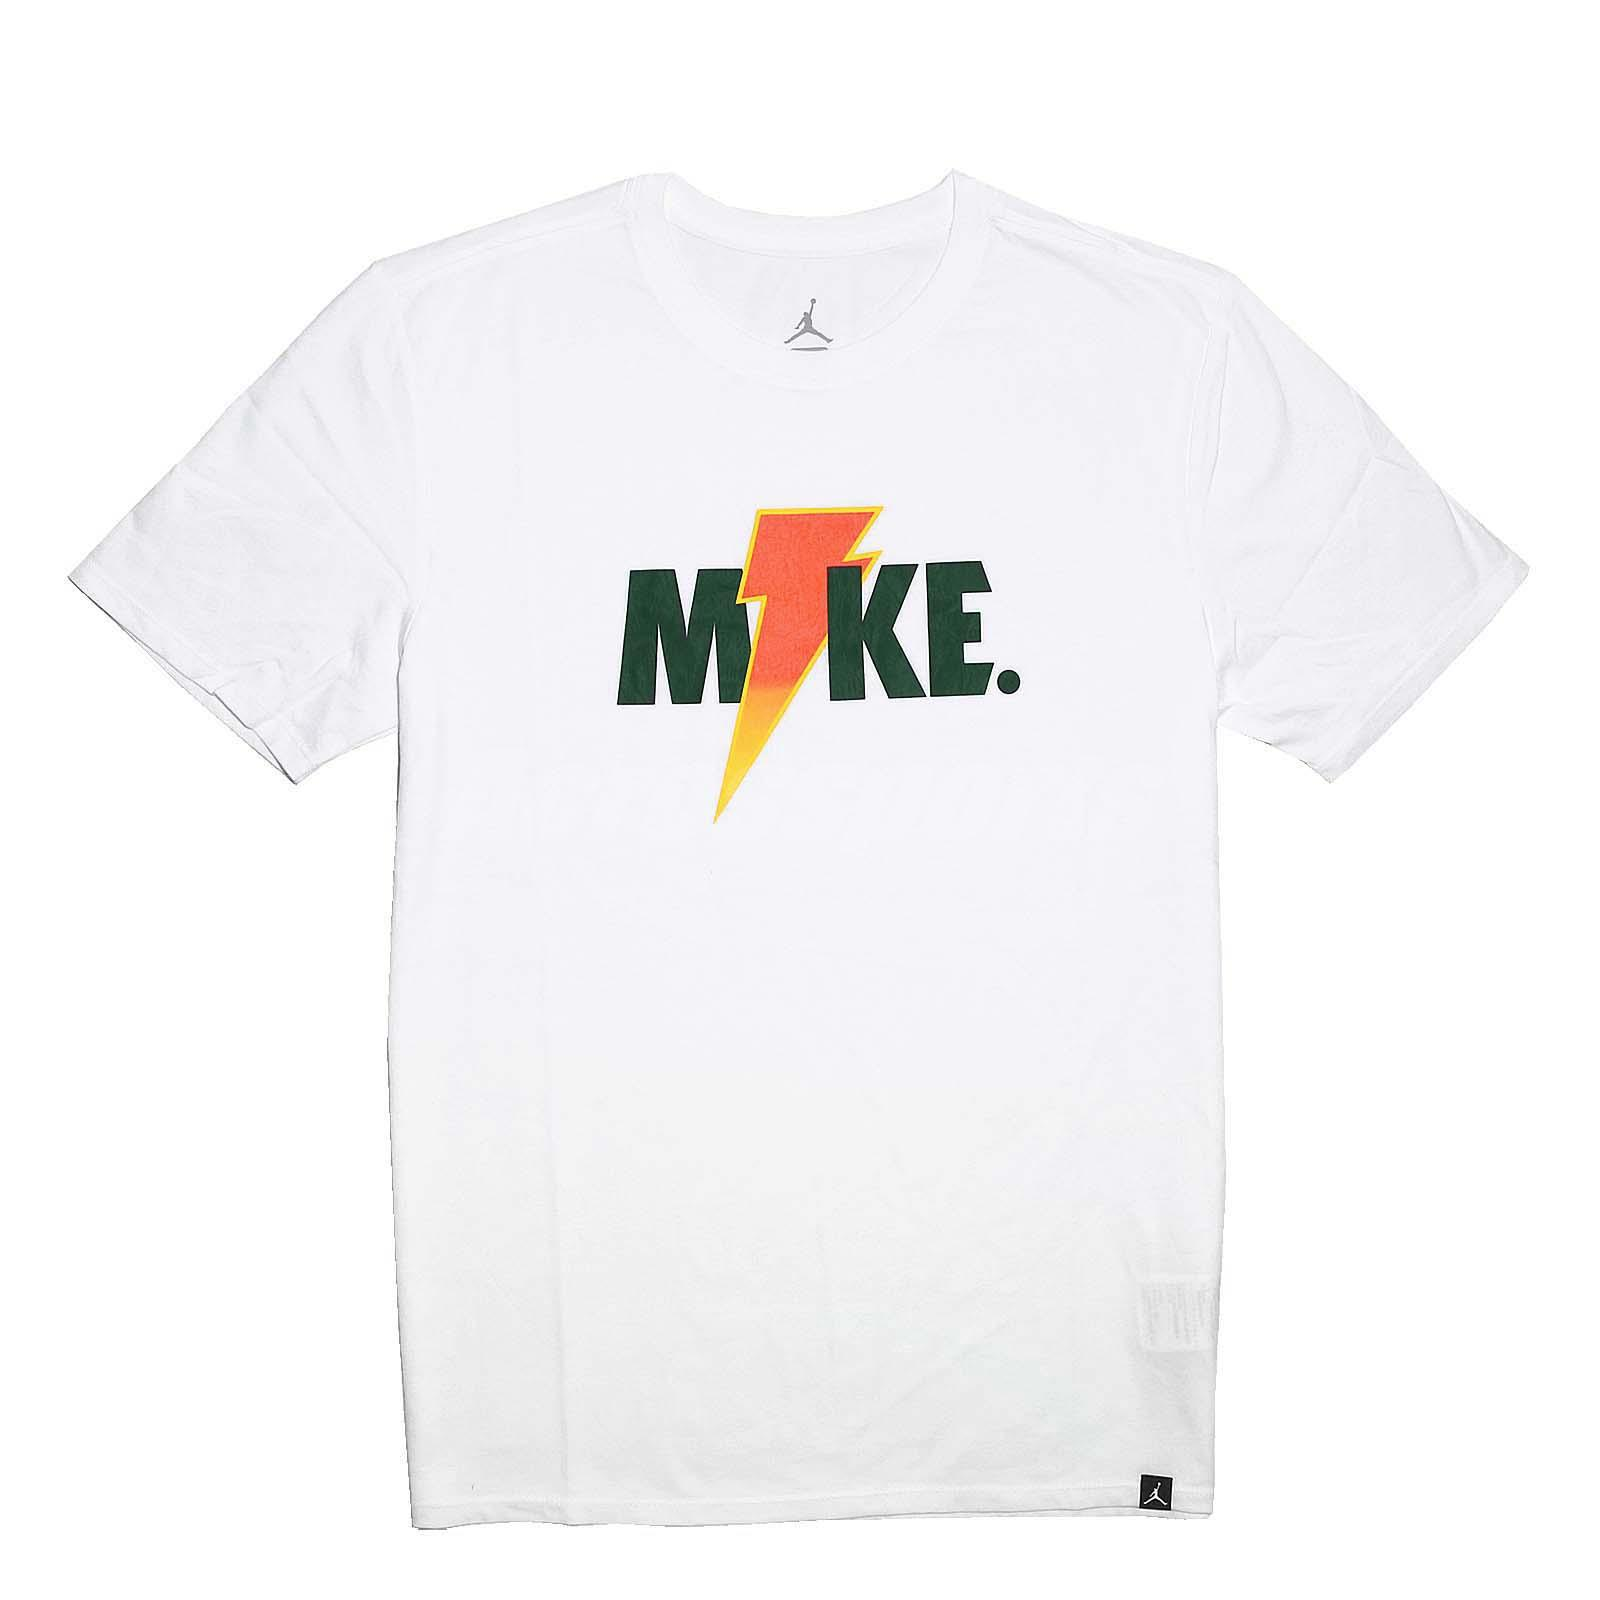 950dc518d57a ... Nike Men JORDAN SPORTSWEAR LIKE MIKE LIGHTNING Tee White Orange Shirt  AJ1164-100 . ...